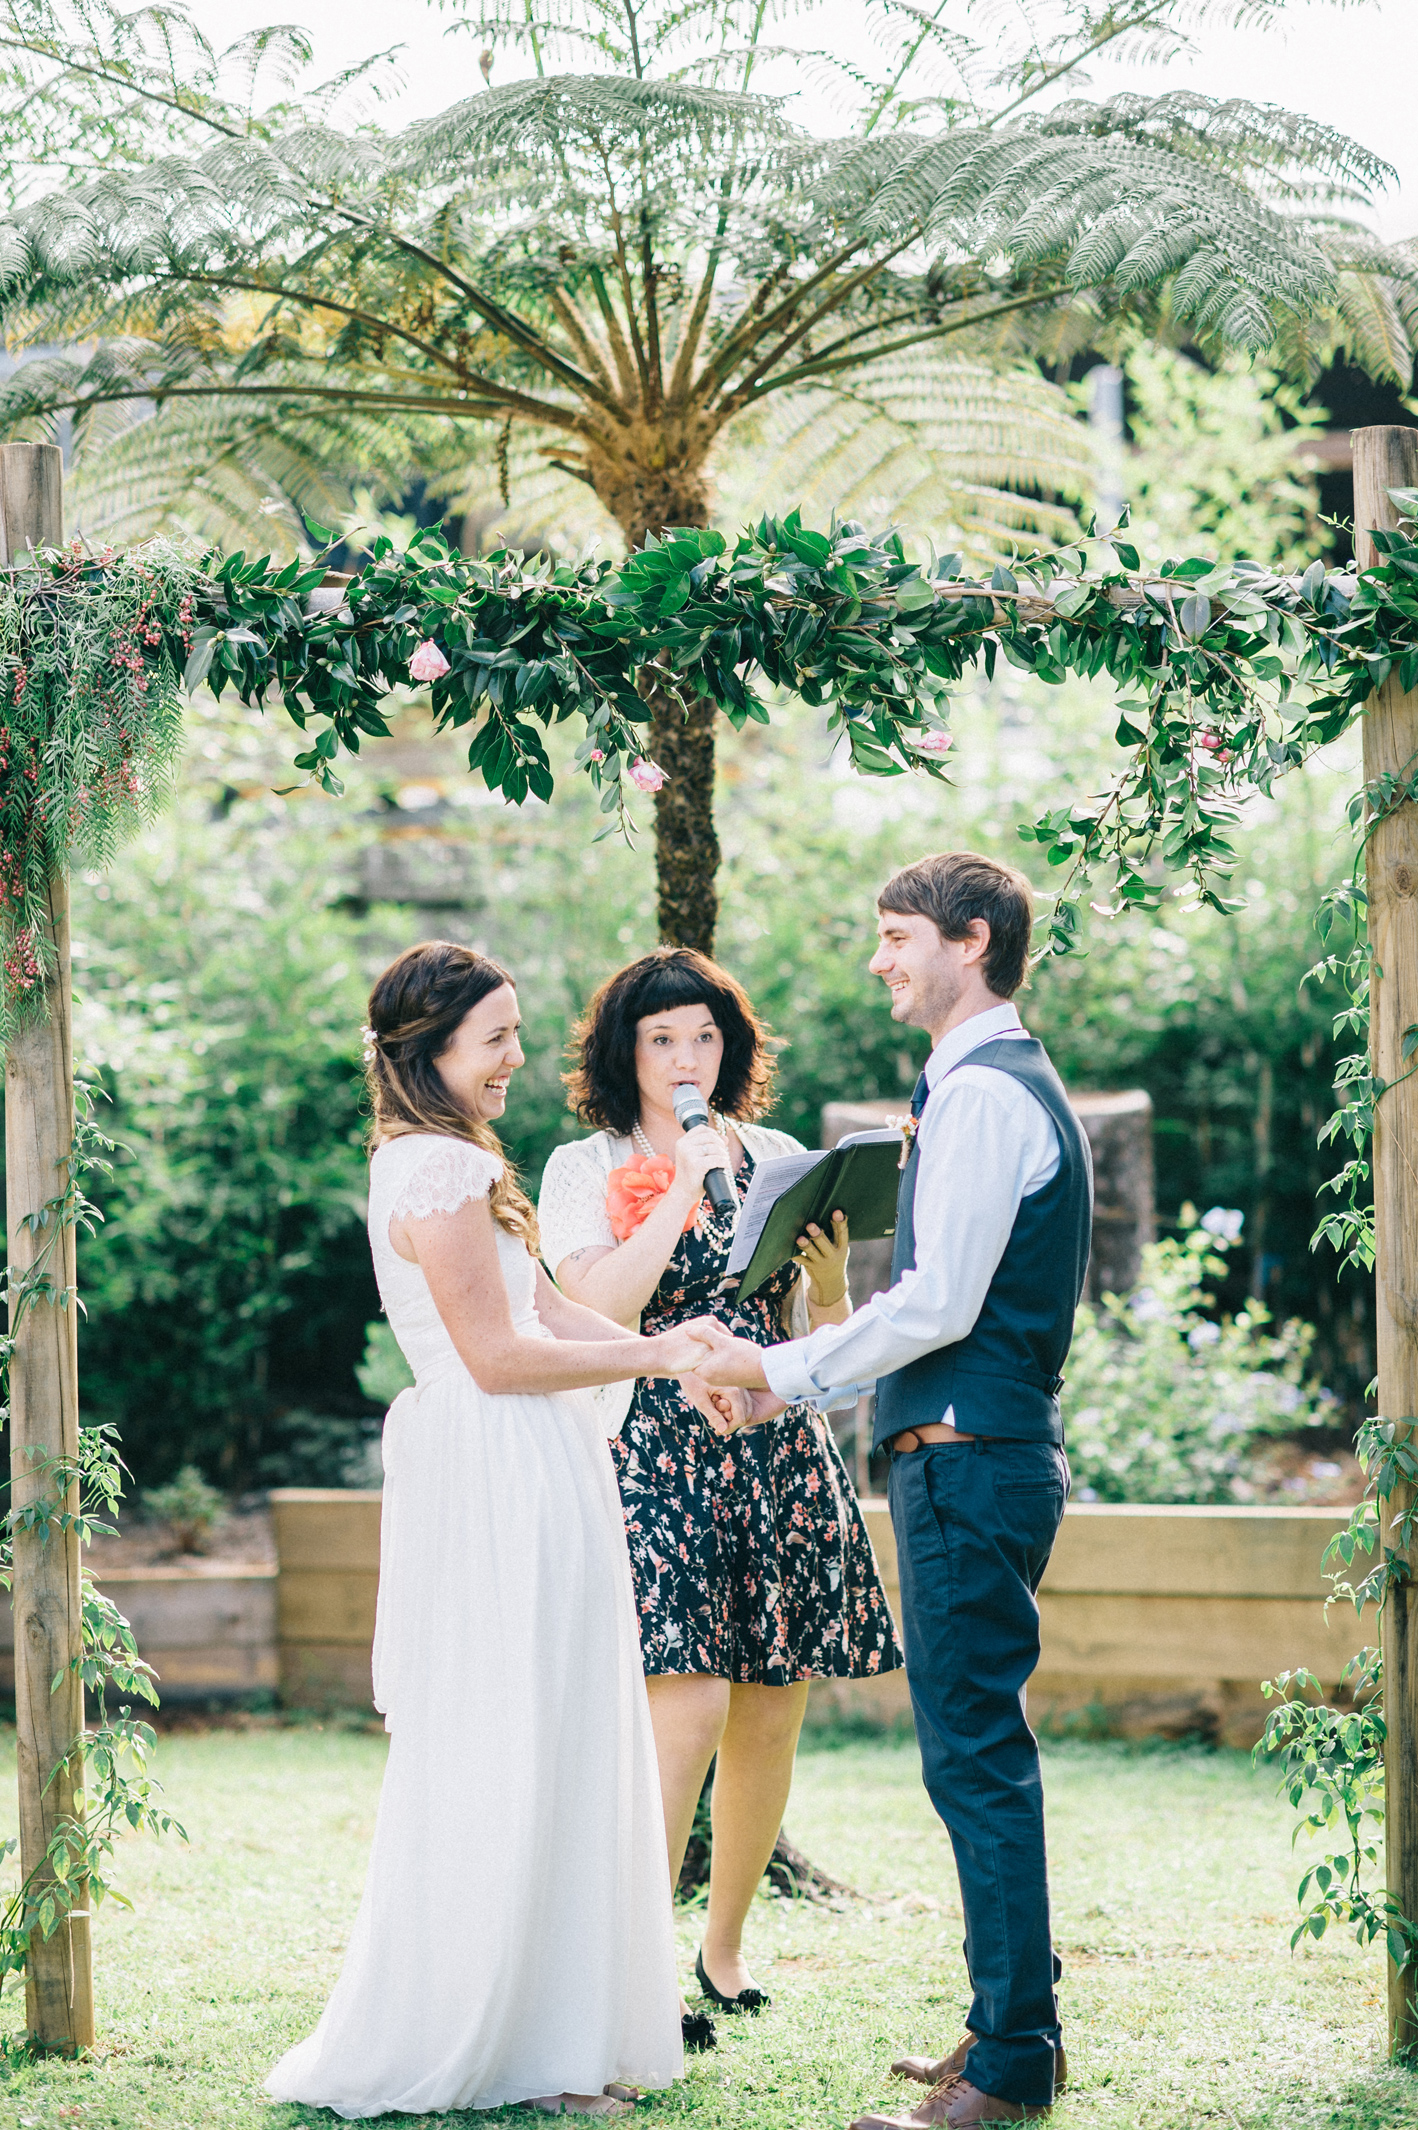 027-michelle-reagan-mount-tamborine-wedding-sophie-baker-photography